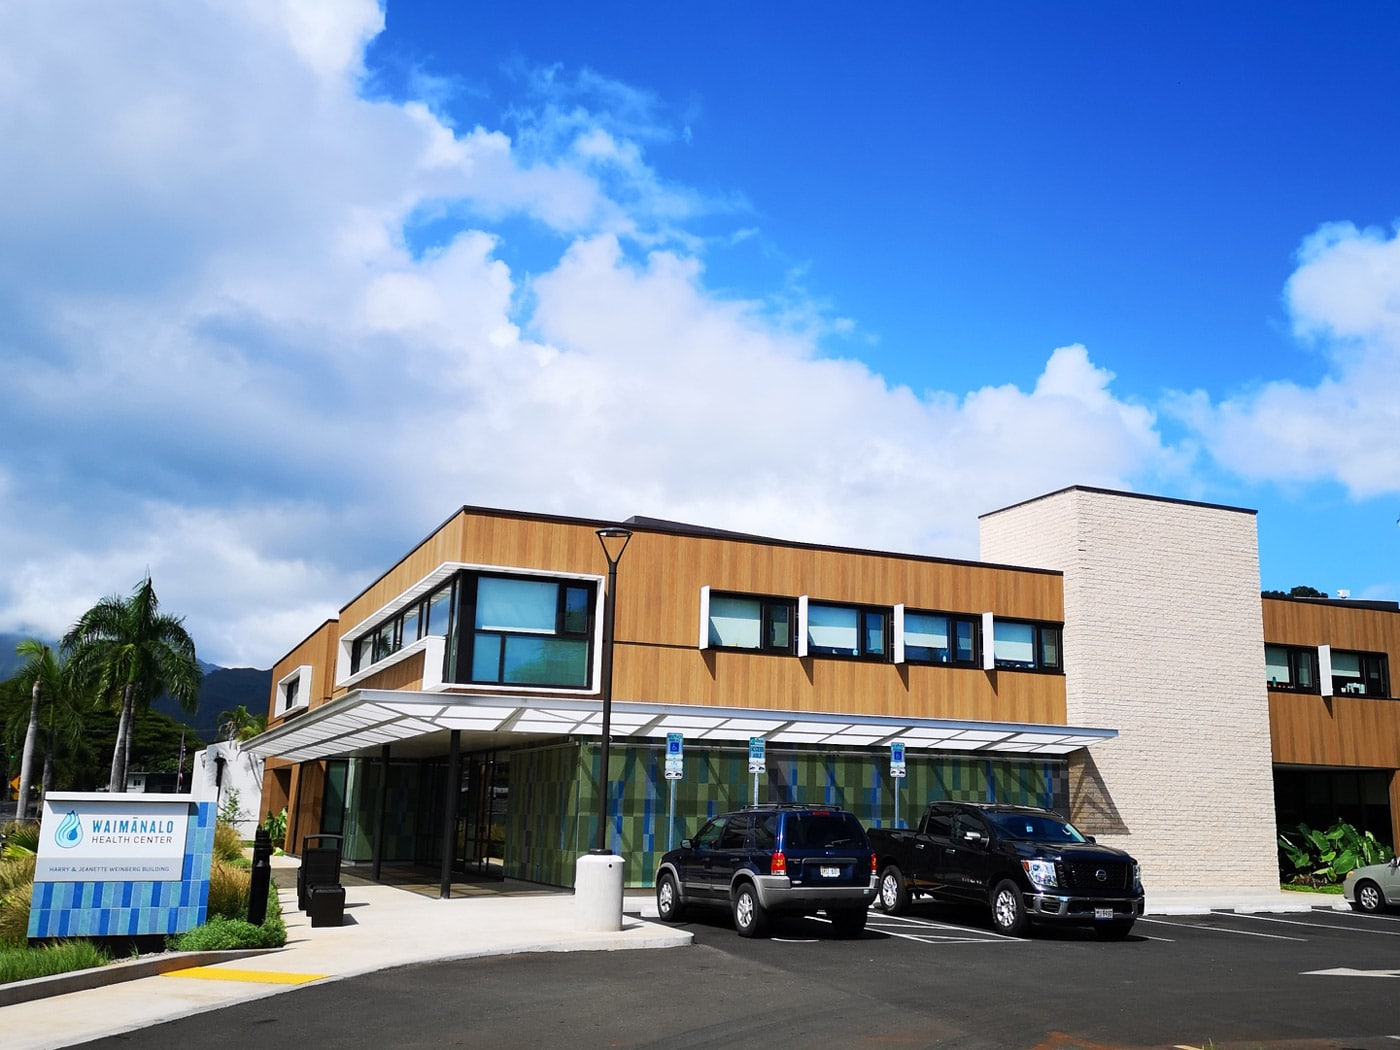 Waimanalo Health Center